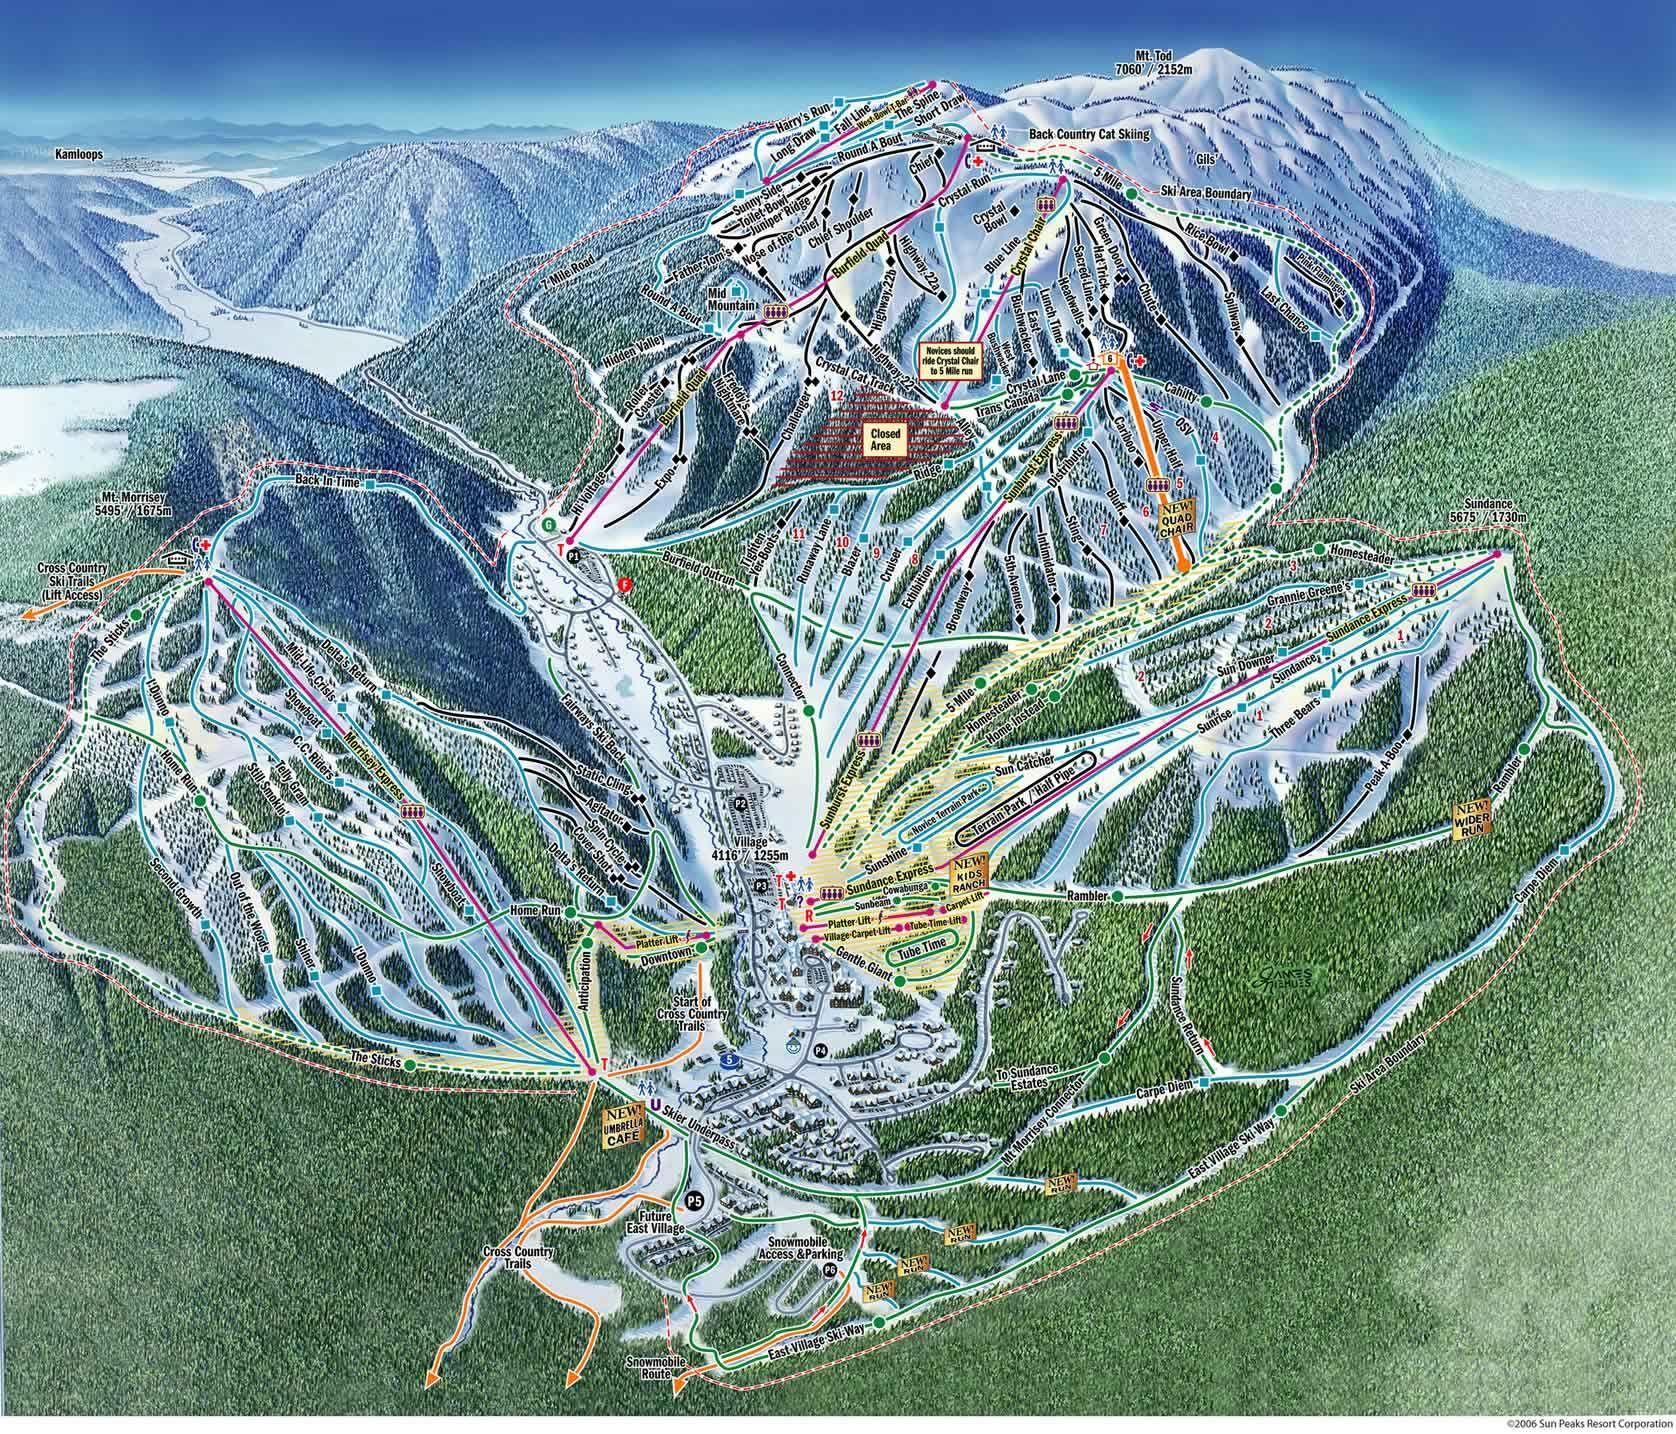 Sun Peaks Ski Resort Map  Canada  Pinterest  Resorts Ski